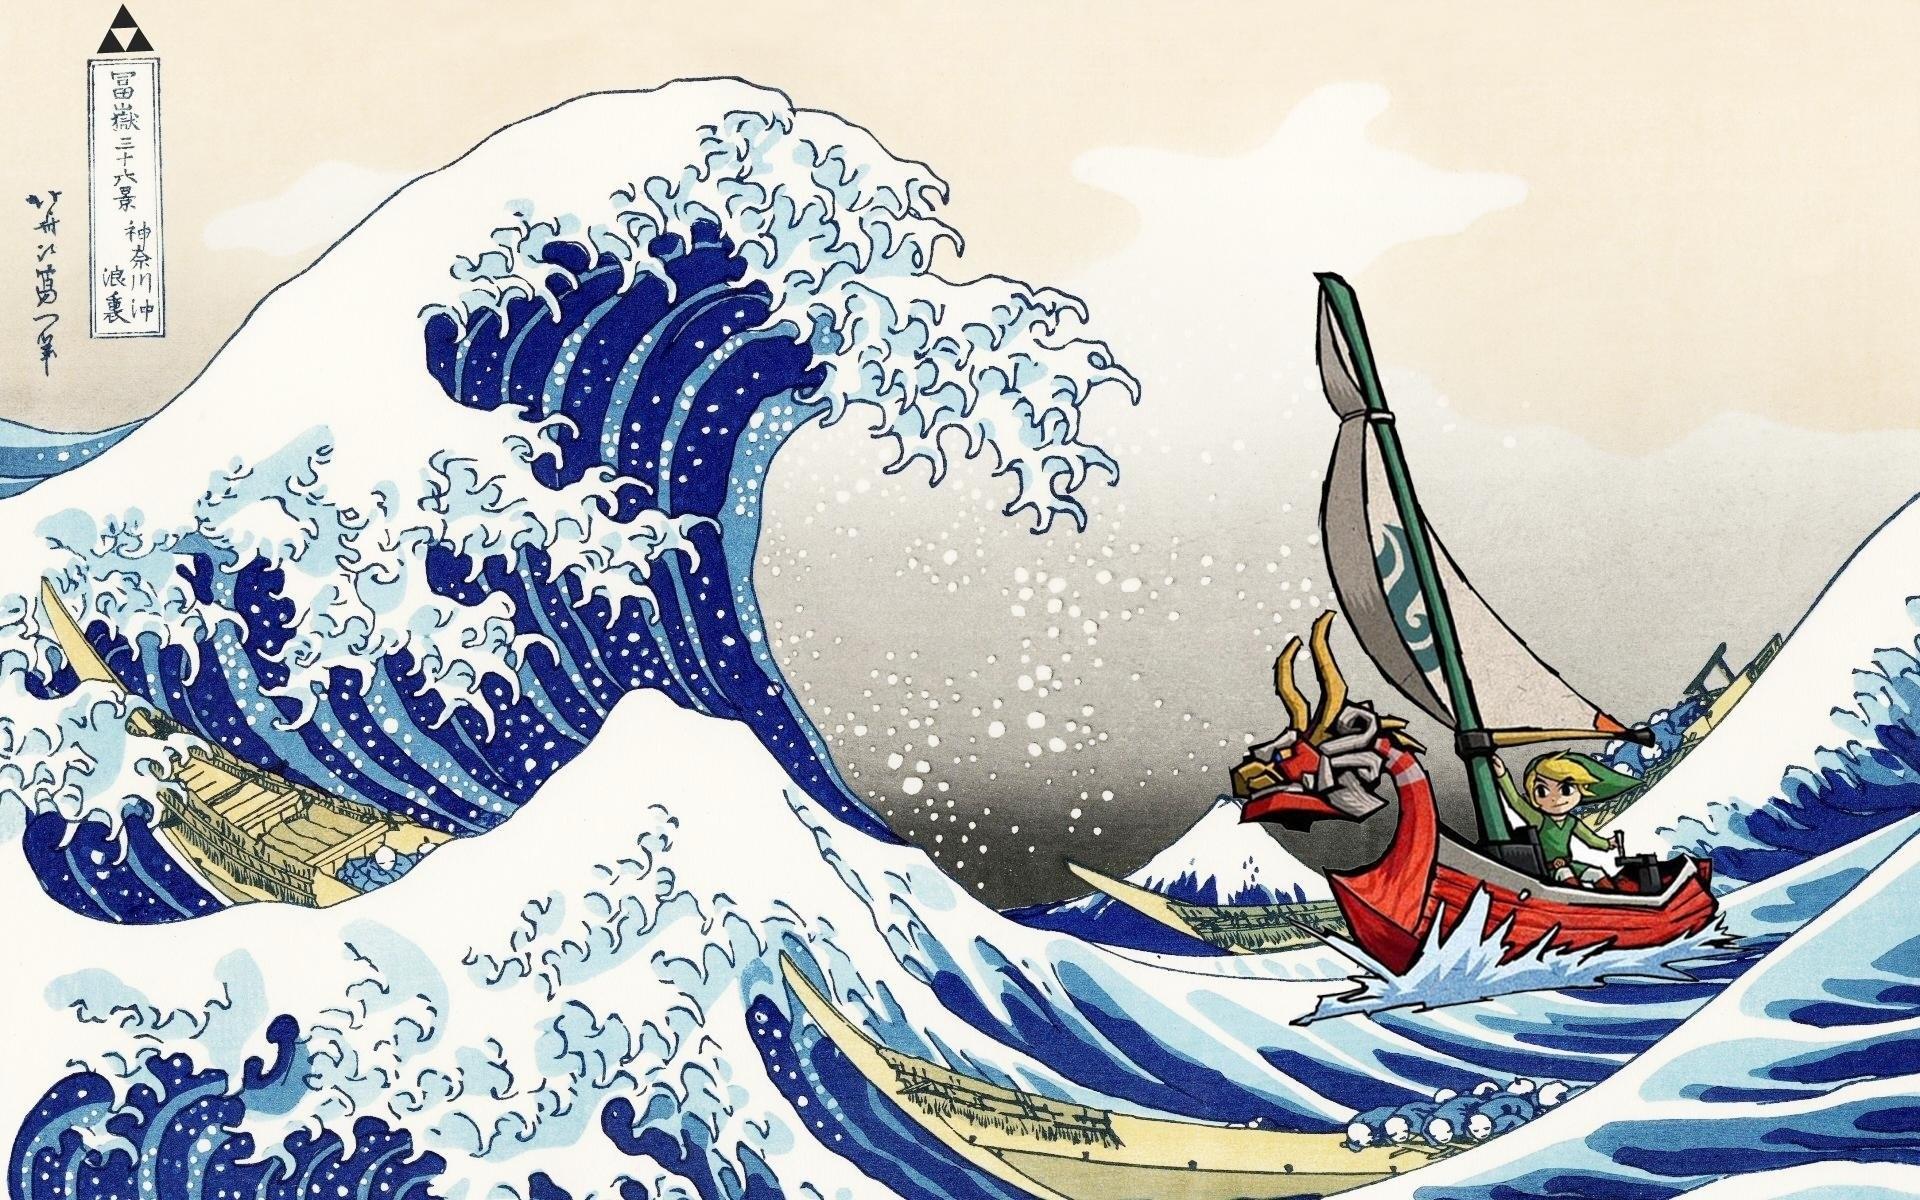 the legend of zelda: the wind waker full hd fond d'écran and arrière